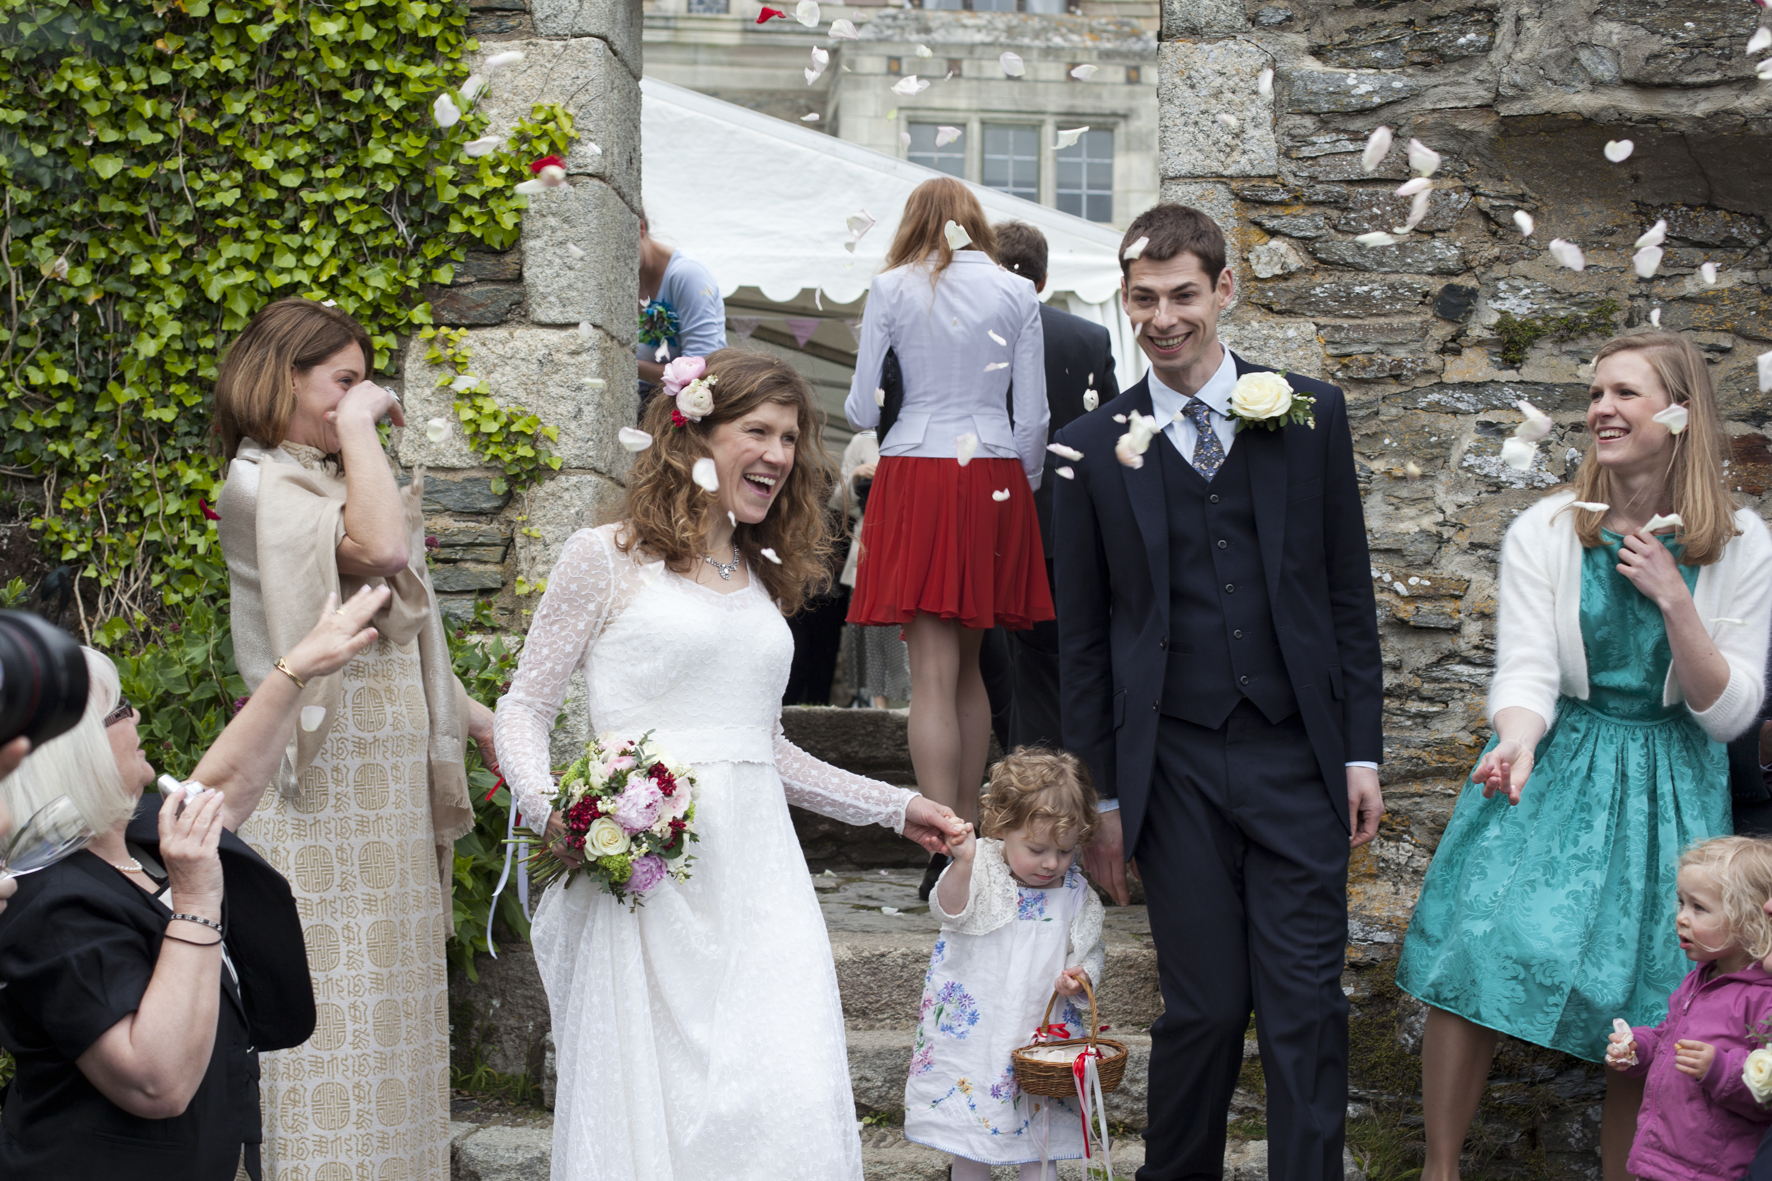 Wedding example_M&P__MG_3632_Claudia Leisinger.jpg